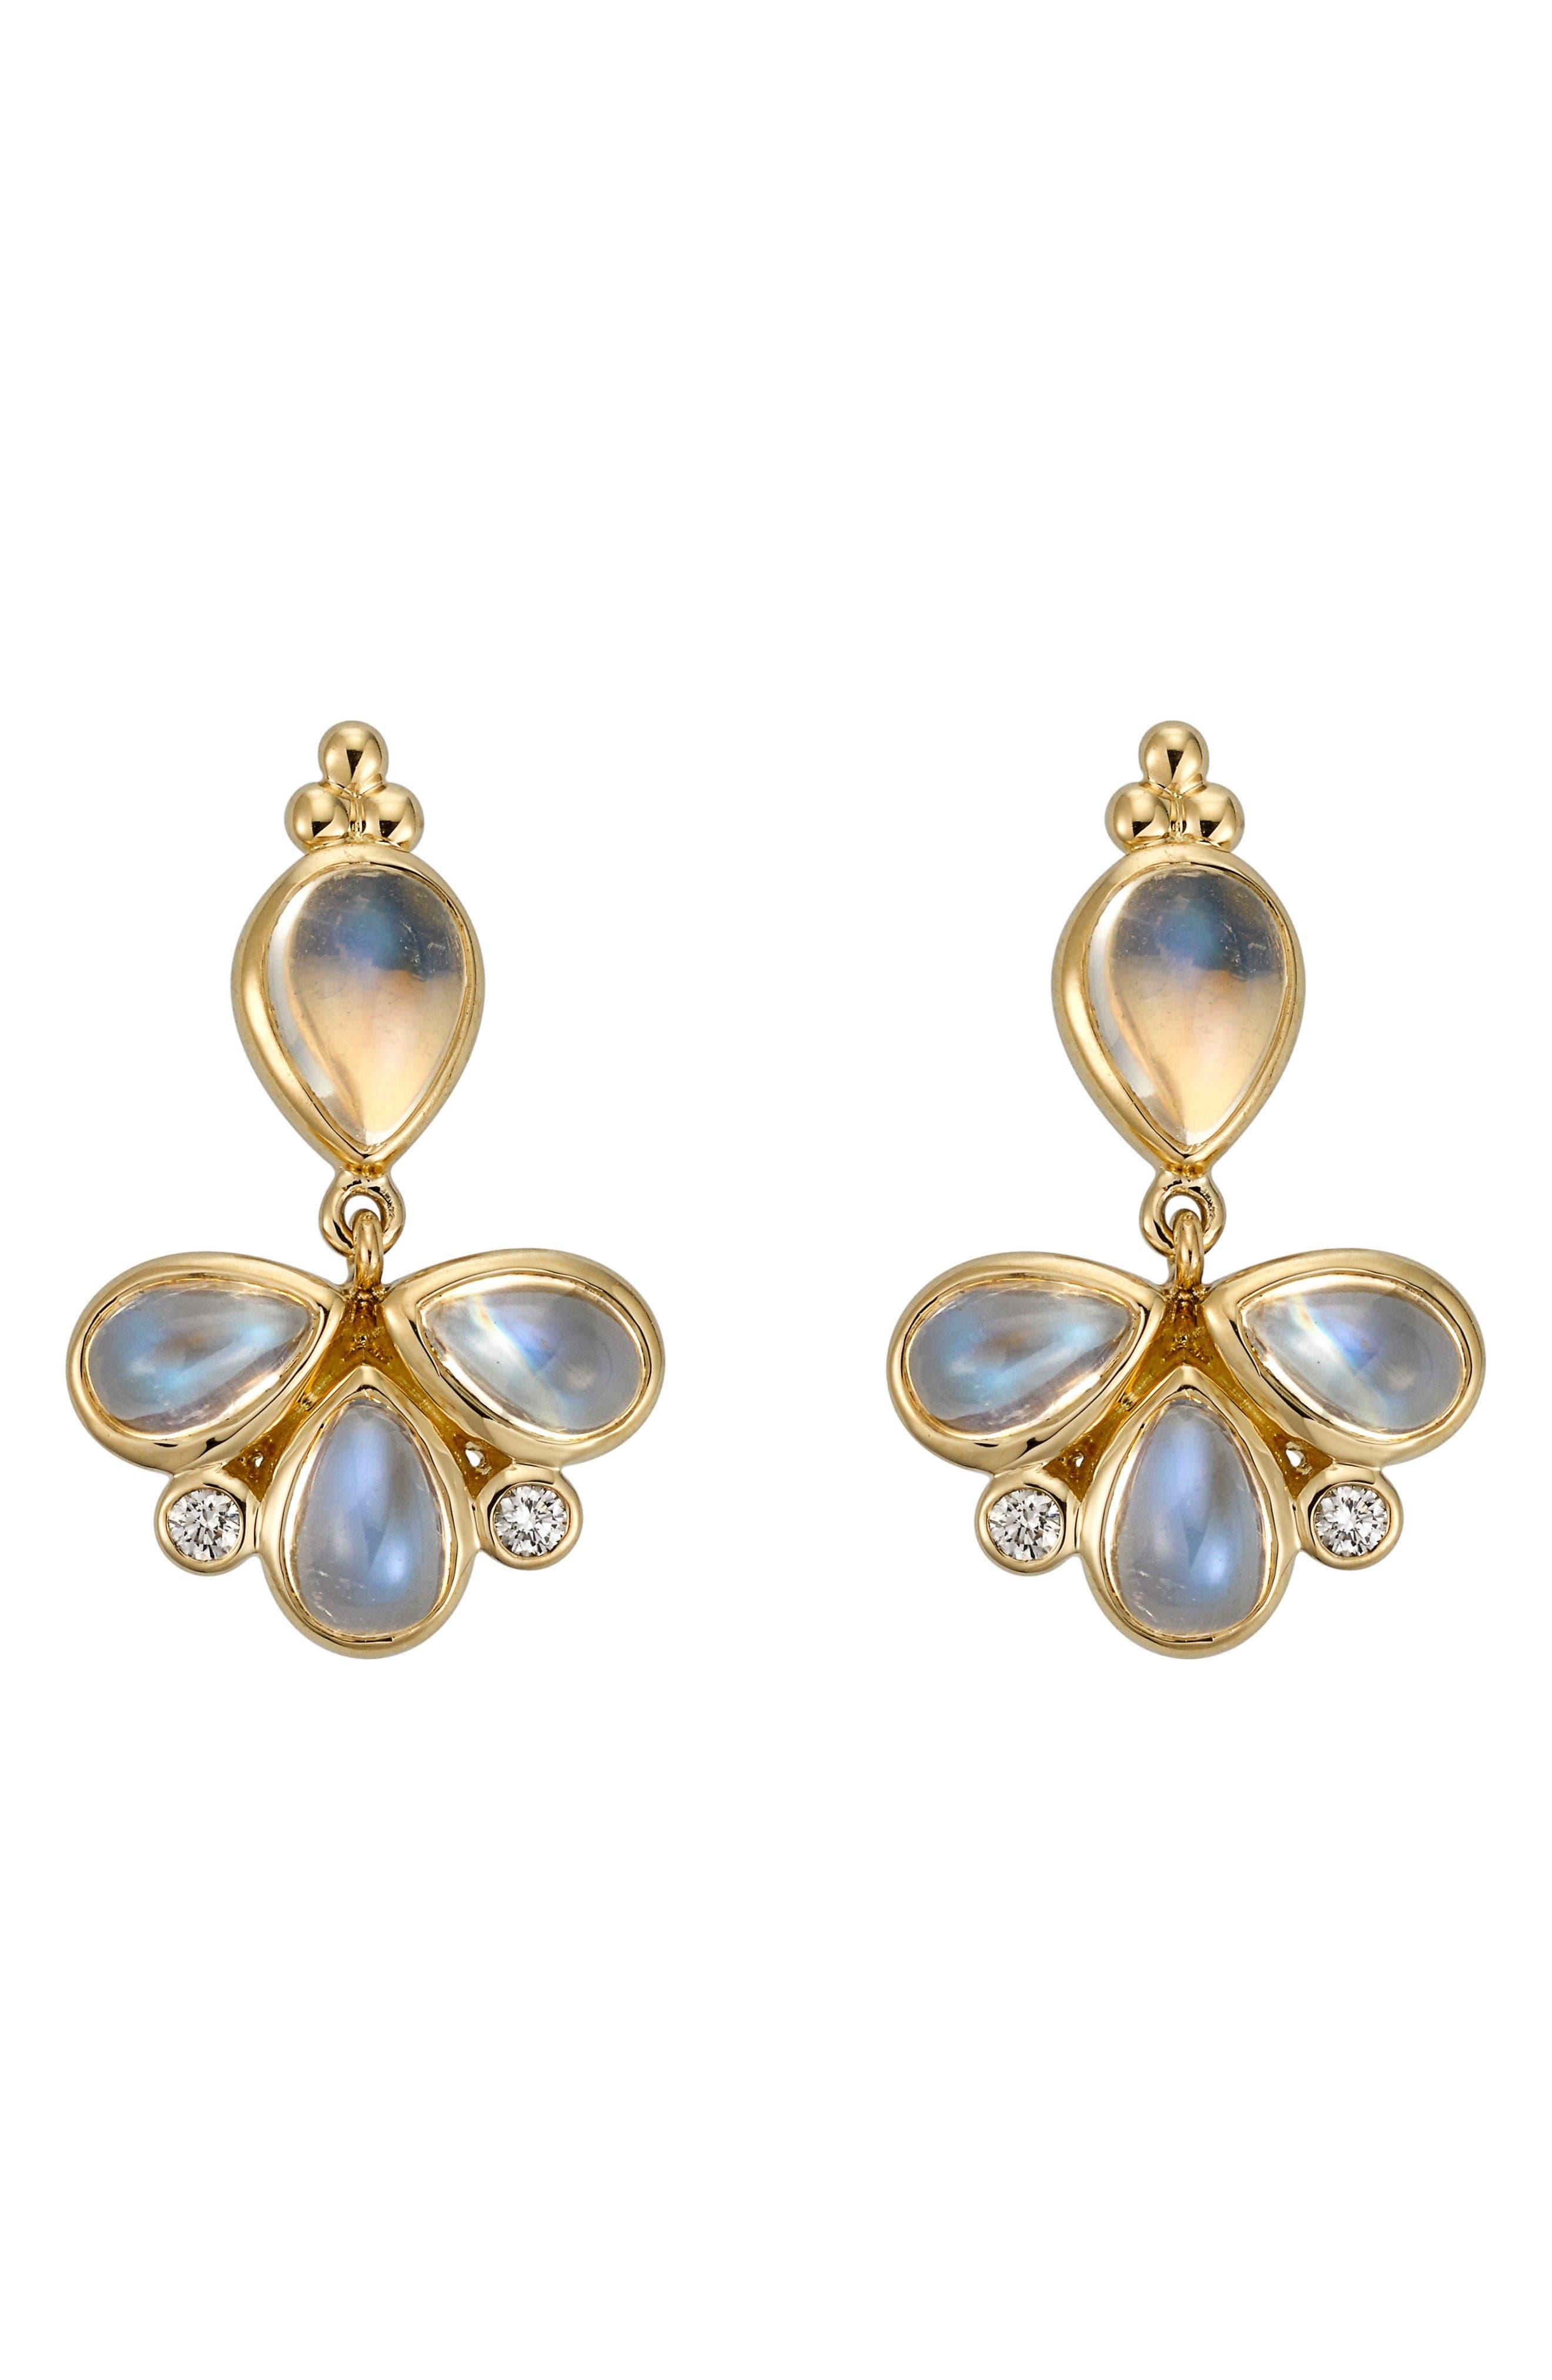 Temple St. Clair Royal Blue Moonstone & Diamond Drop Earrings,                         Main,                         color, Yellow Gold/ Blue Moonstone